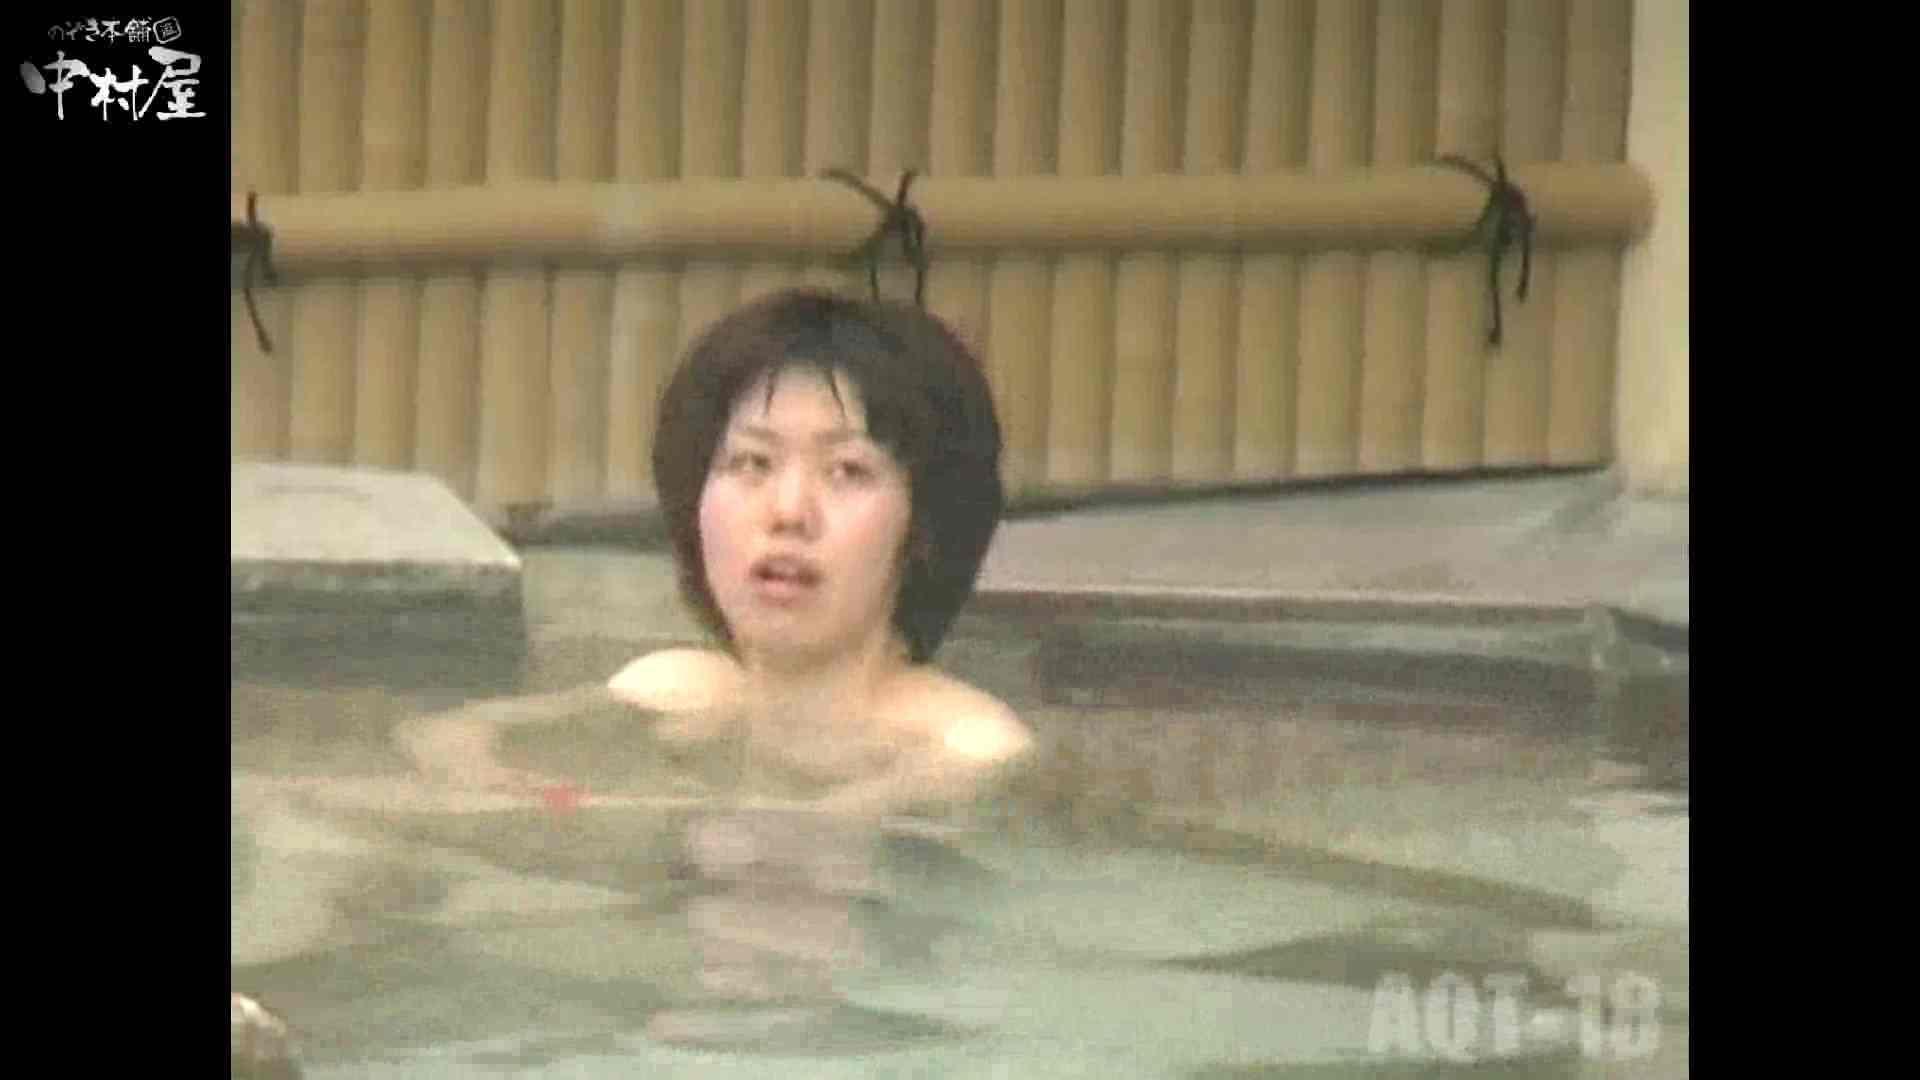 Aquaな露天風呂Vol.882潜入盗撮露天風呂十八判湯 其の七 盗撮 | 潜入  113連発 17